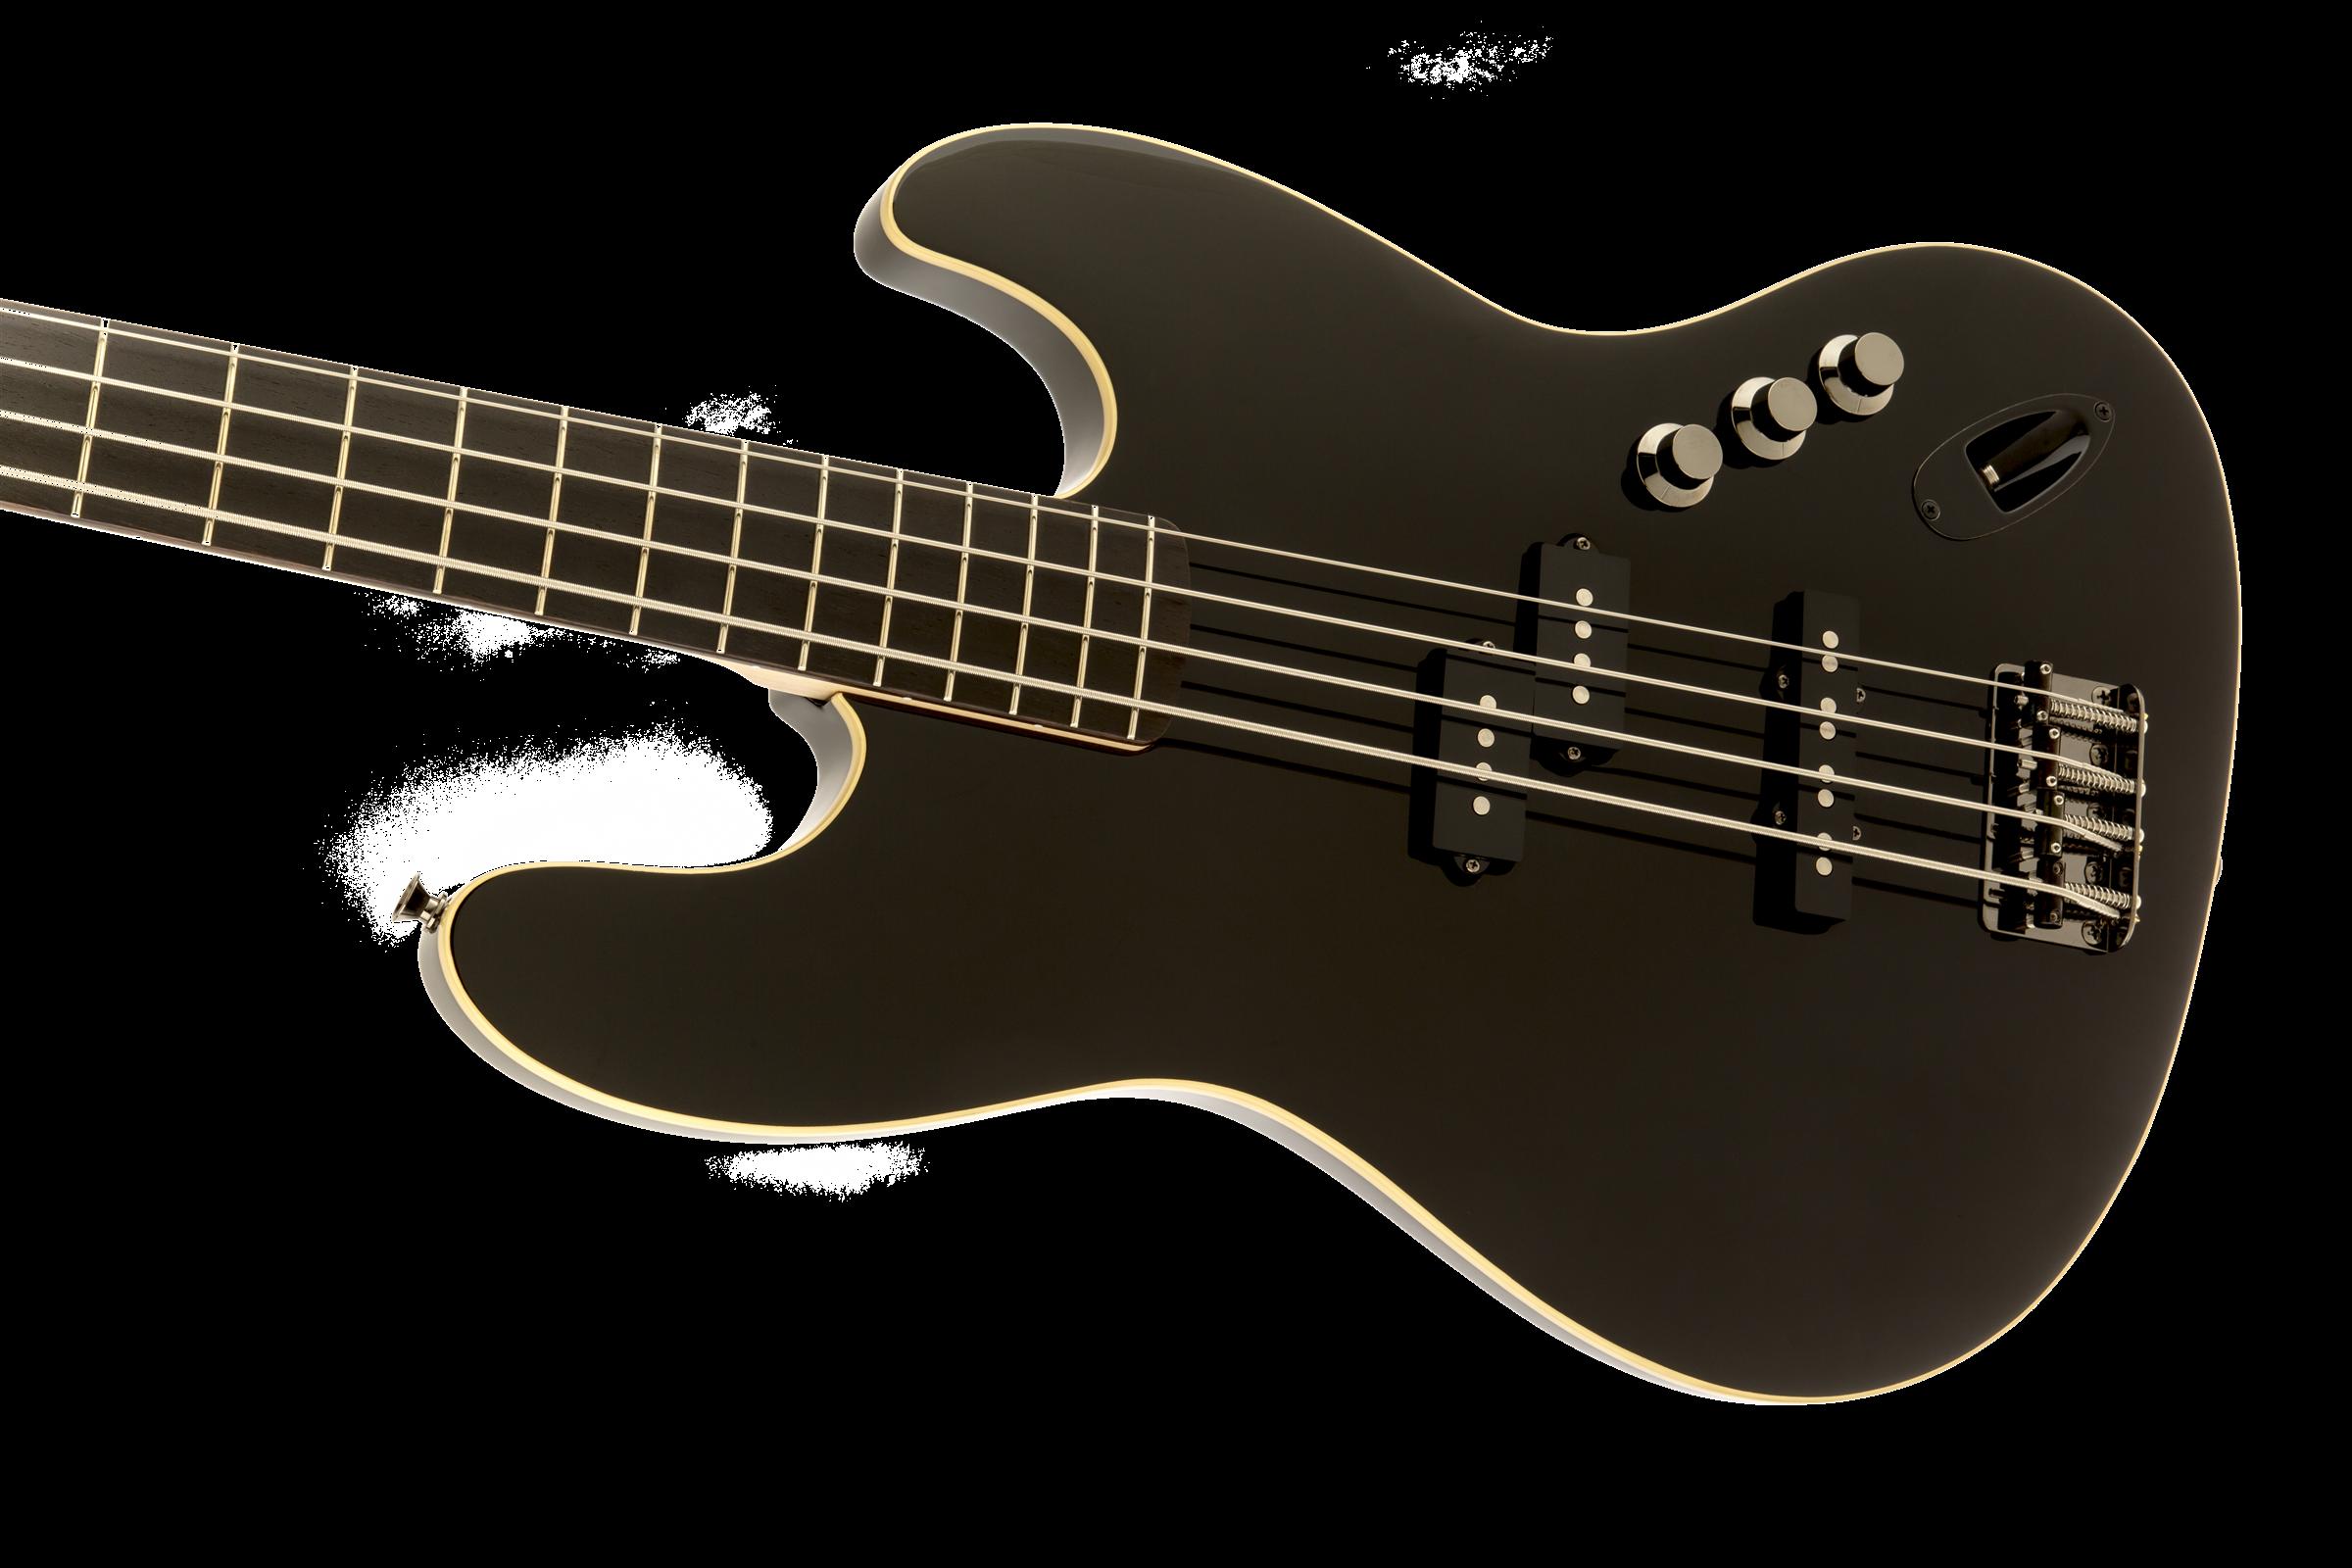 Fender Aerodyne Jazz Bass Wiring Diagram Modern Design Of Electric Guitar Wire Pa Fortis Rh Strateeg Eu